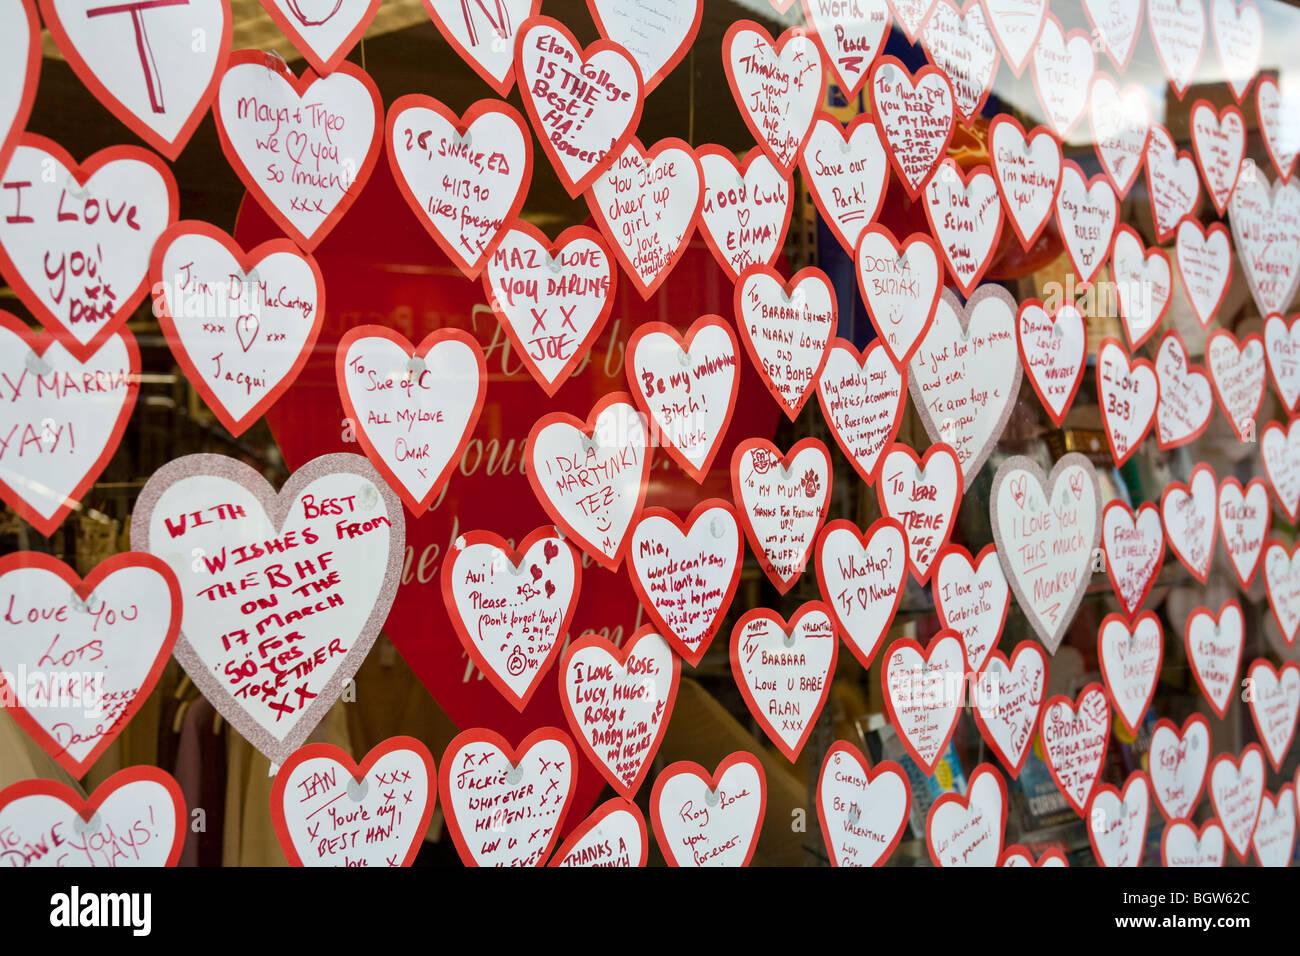 Valentines Day Shop Window Display Stock Photos